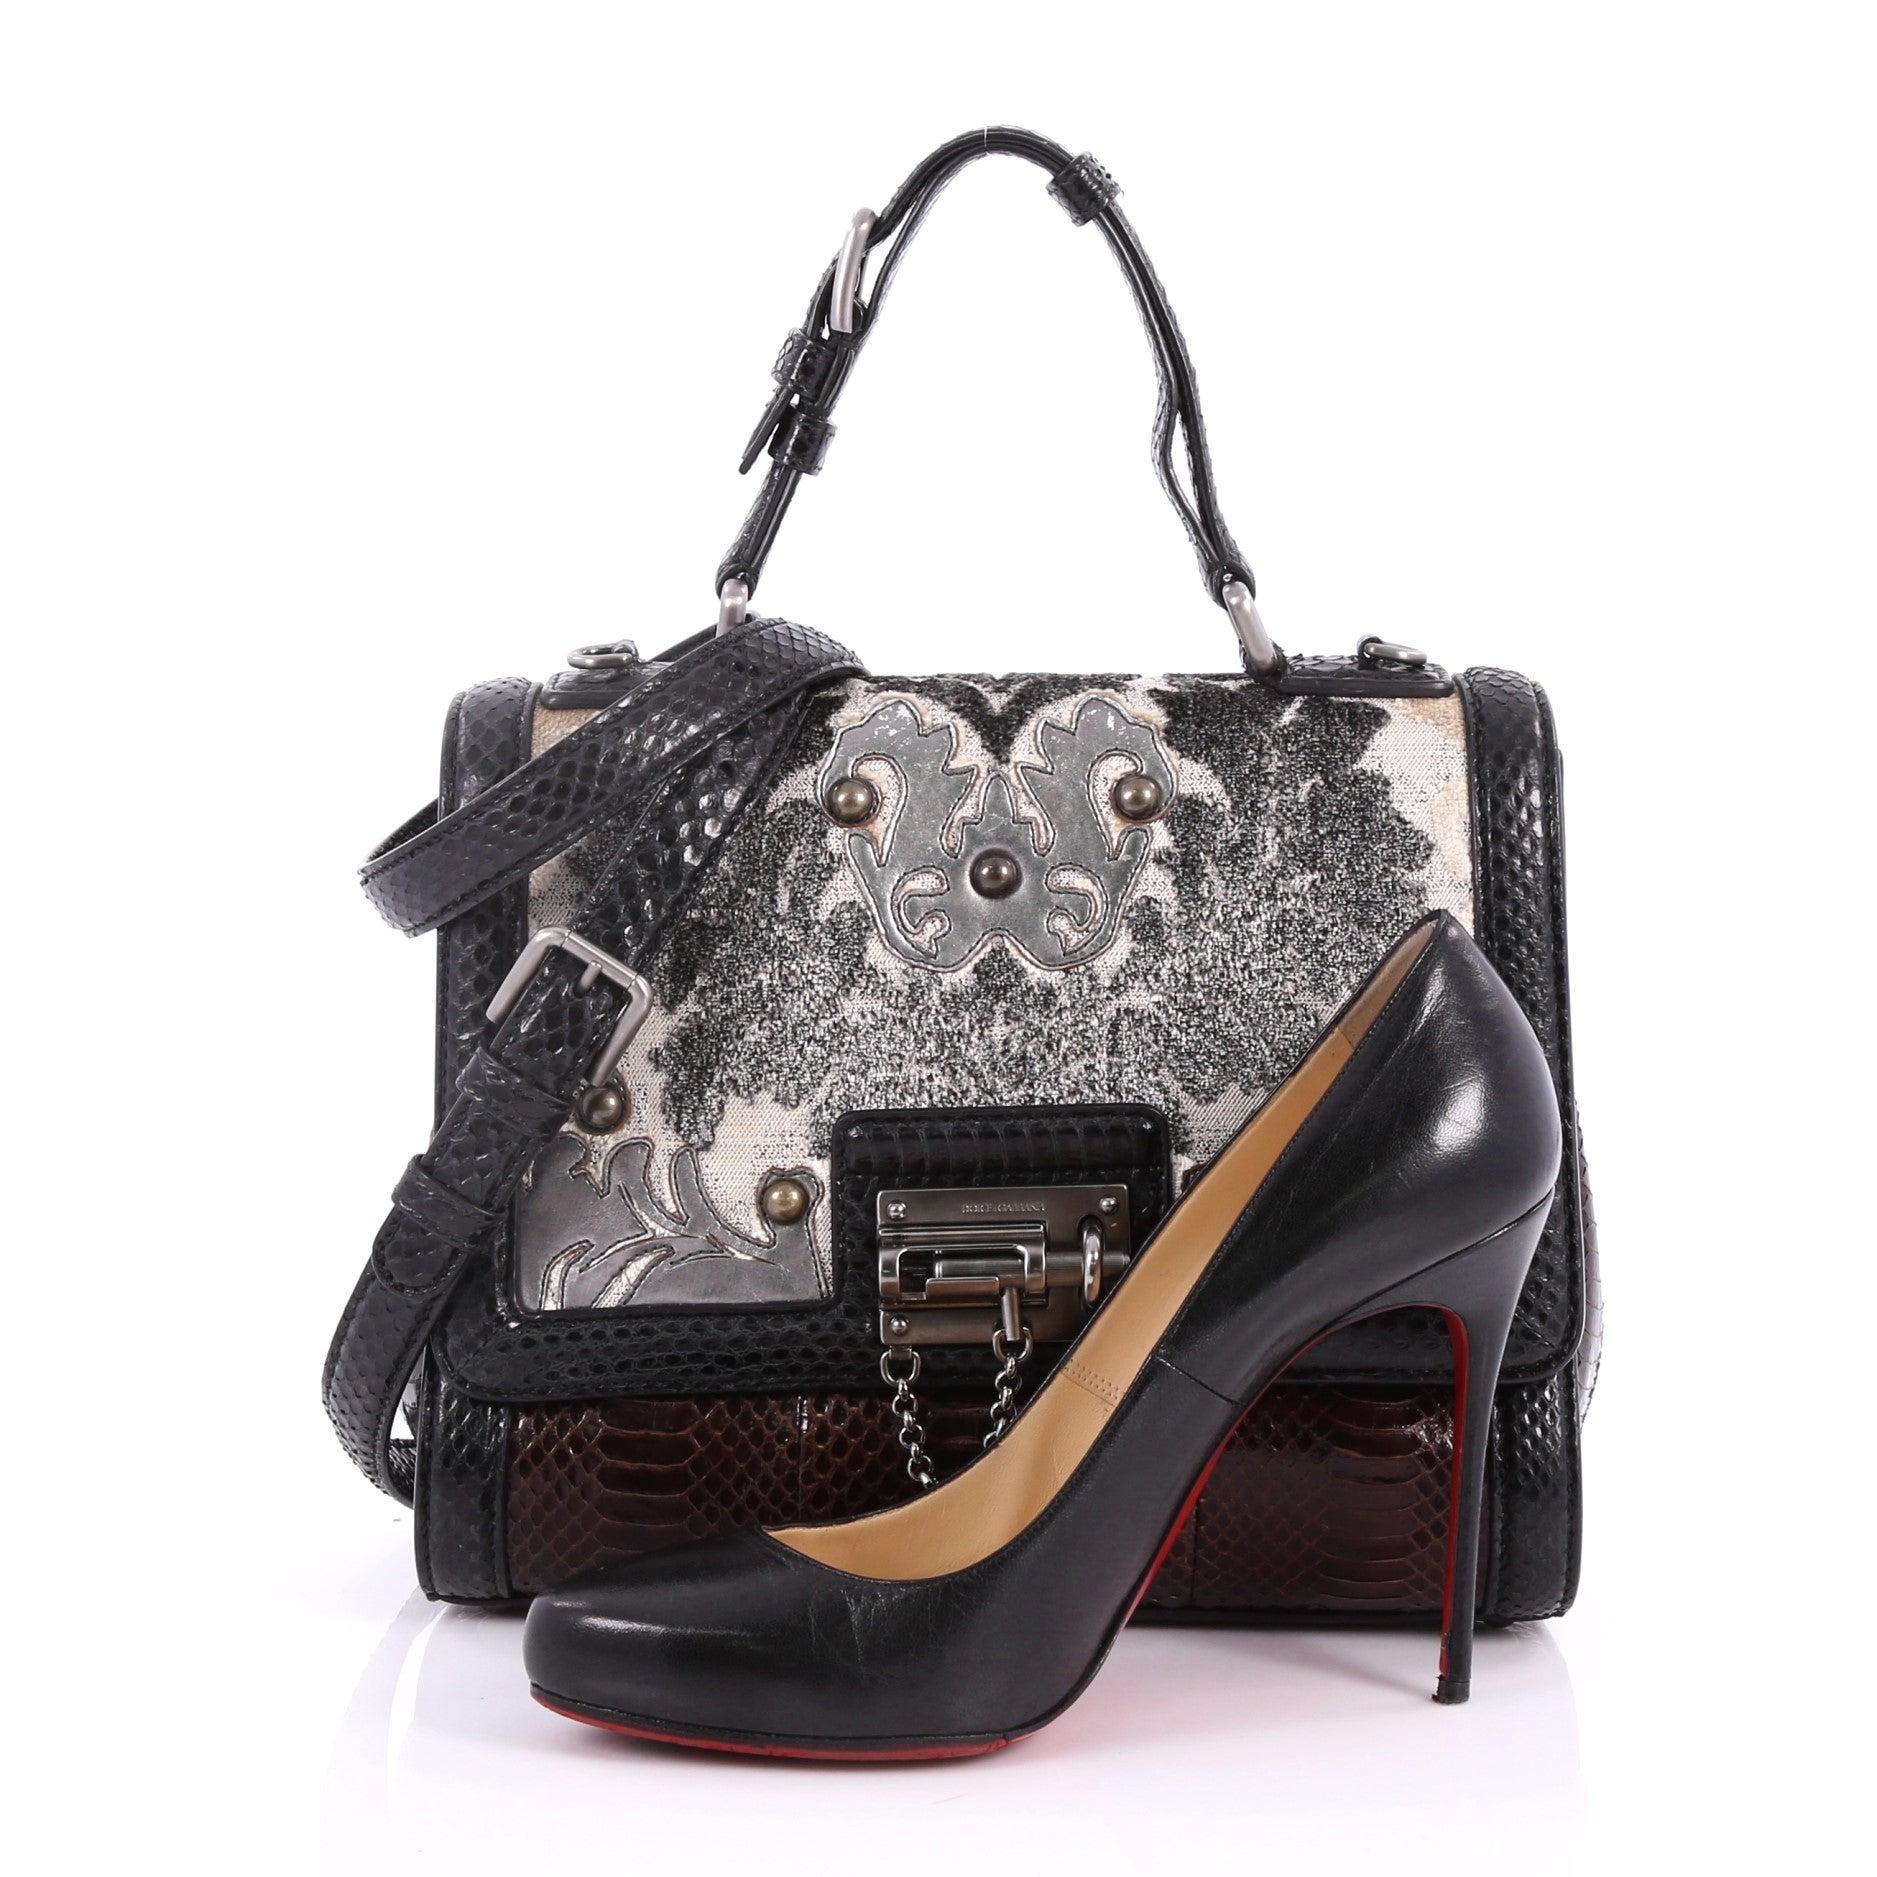 b342997b99 Dolce and Gabbana Monica Handbag Brocade and Python Medium at 1stdibs